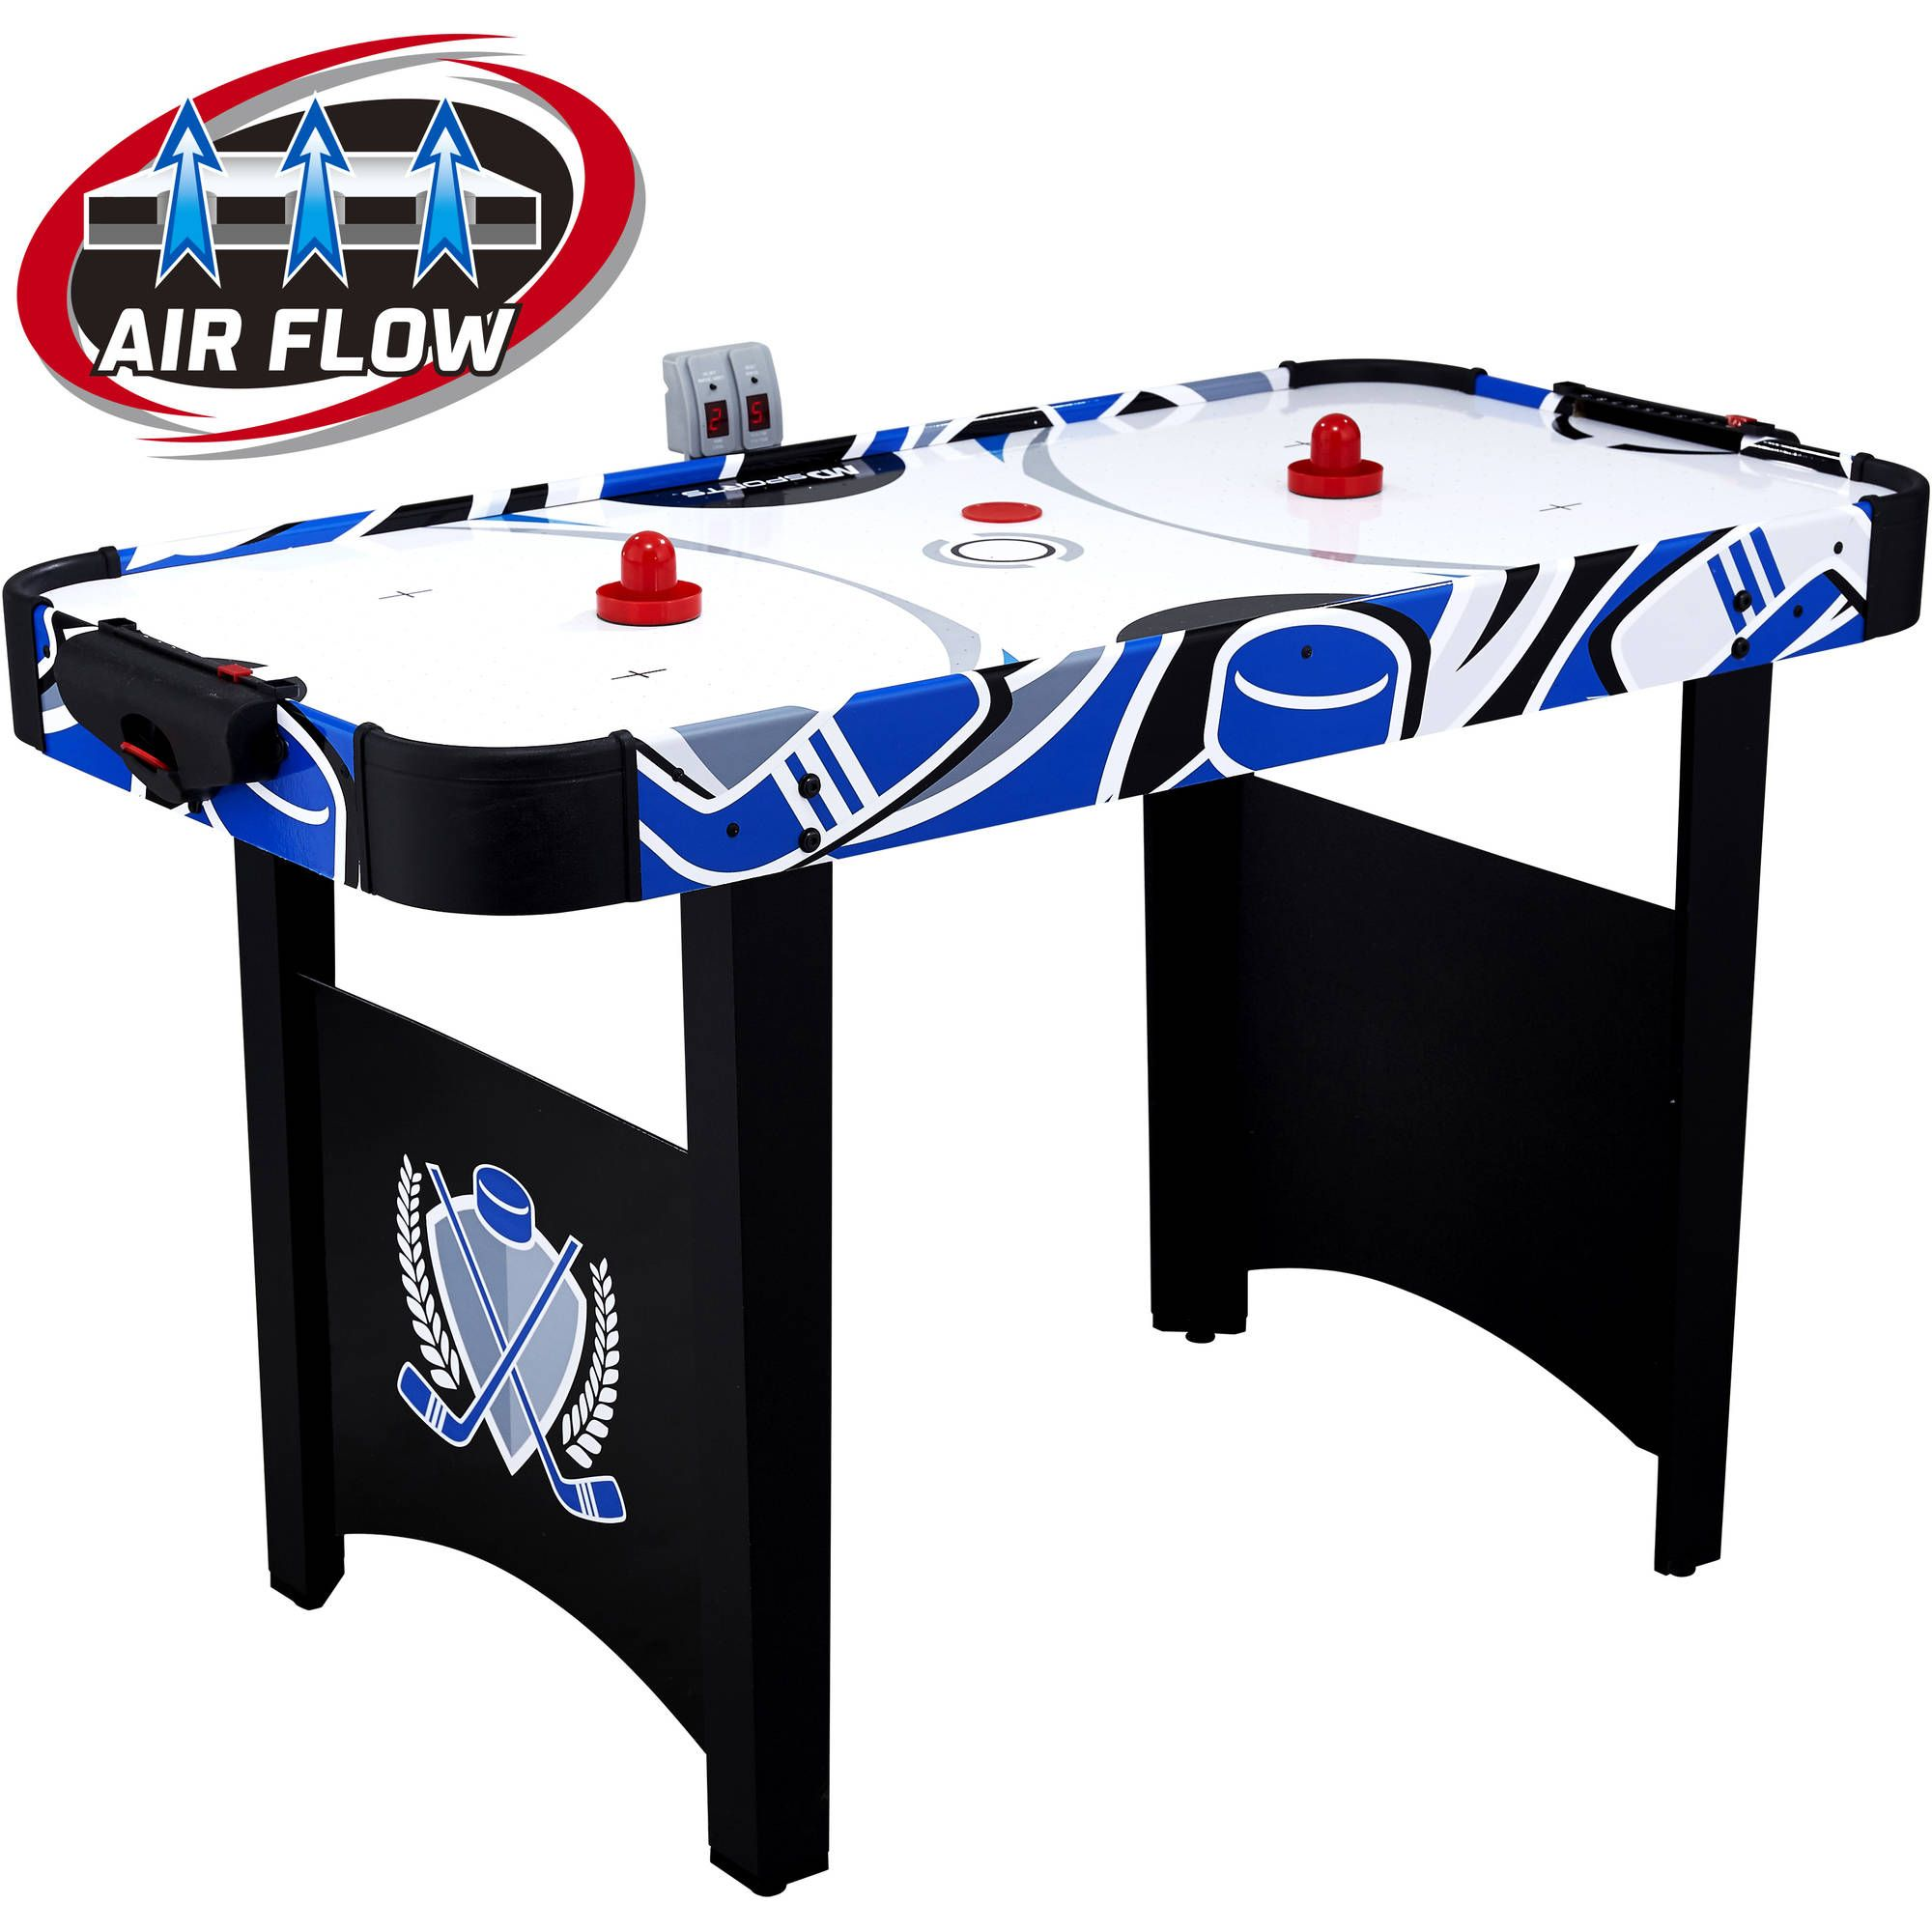 Md Sports 48 Air Powered Hockey Table 33 89 Air Hockey Air Hockey Table Sports Games For Kids